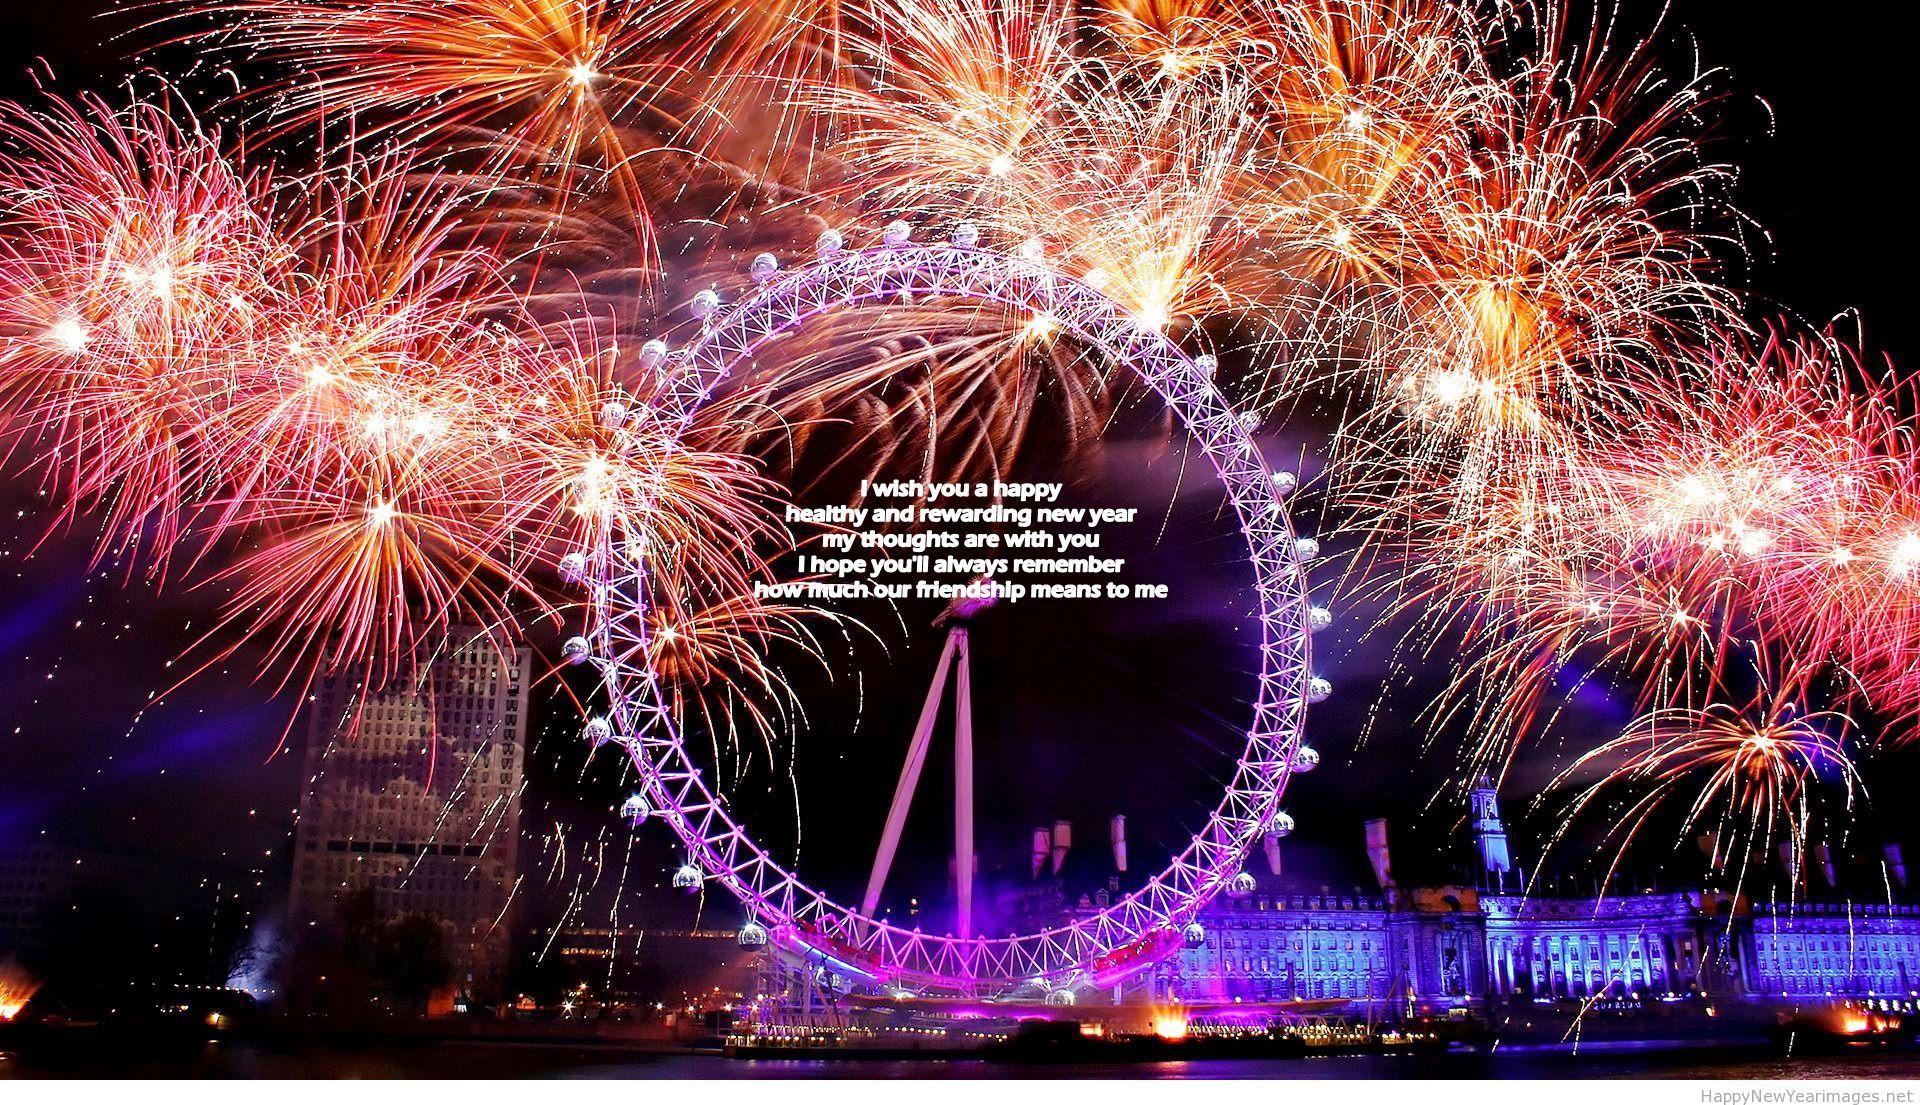 New Year Celebration Happy New Year Hd Fireworks Happy New Year Photo New Years Eve Fireworks London Fireworks